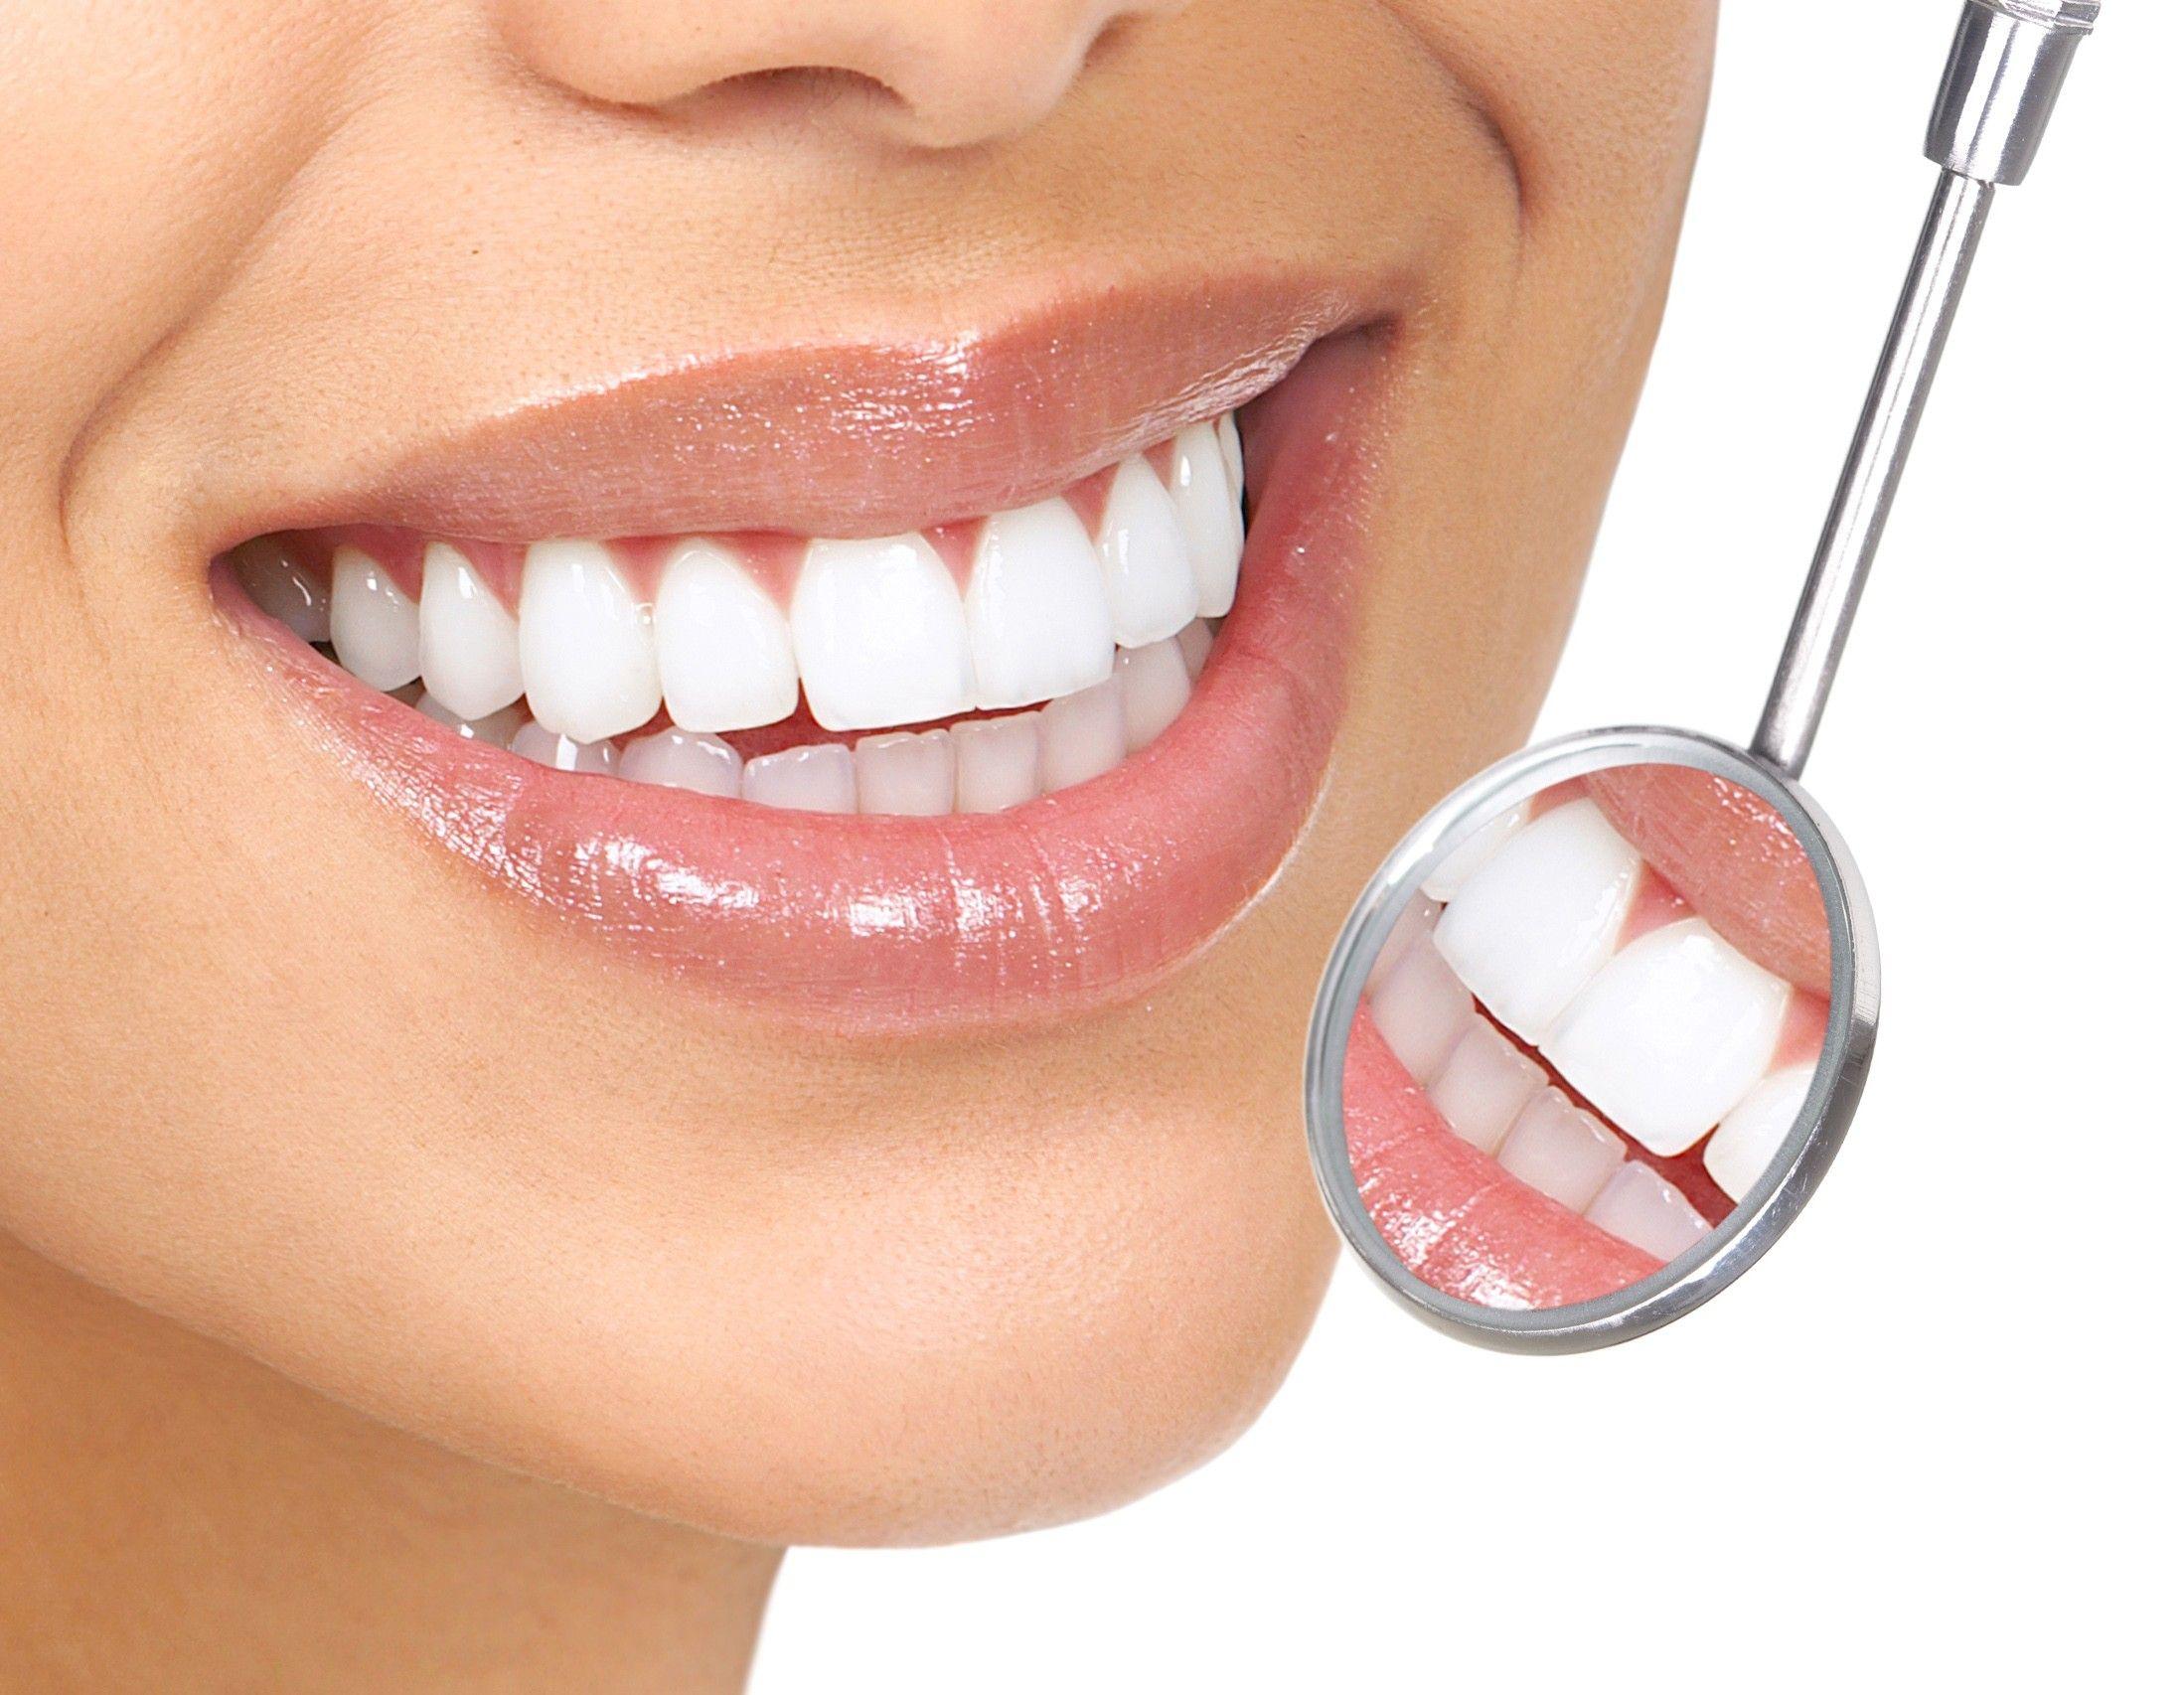 Discount Dental Plans